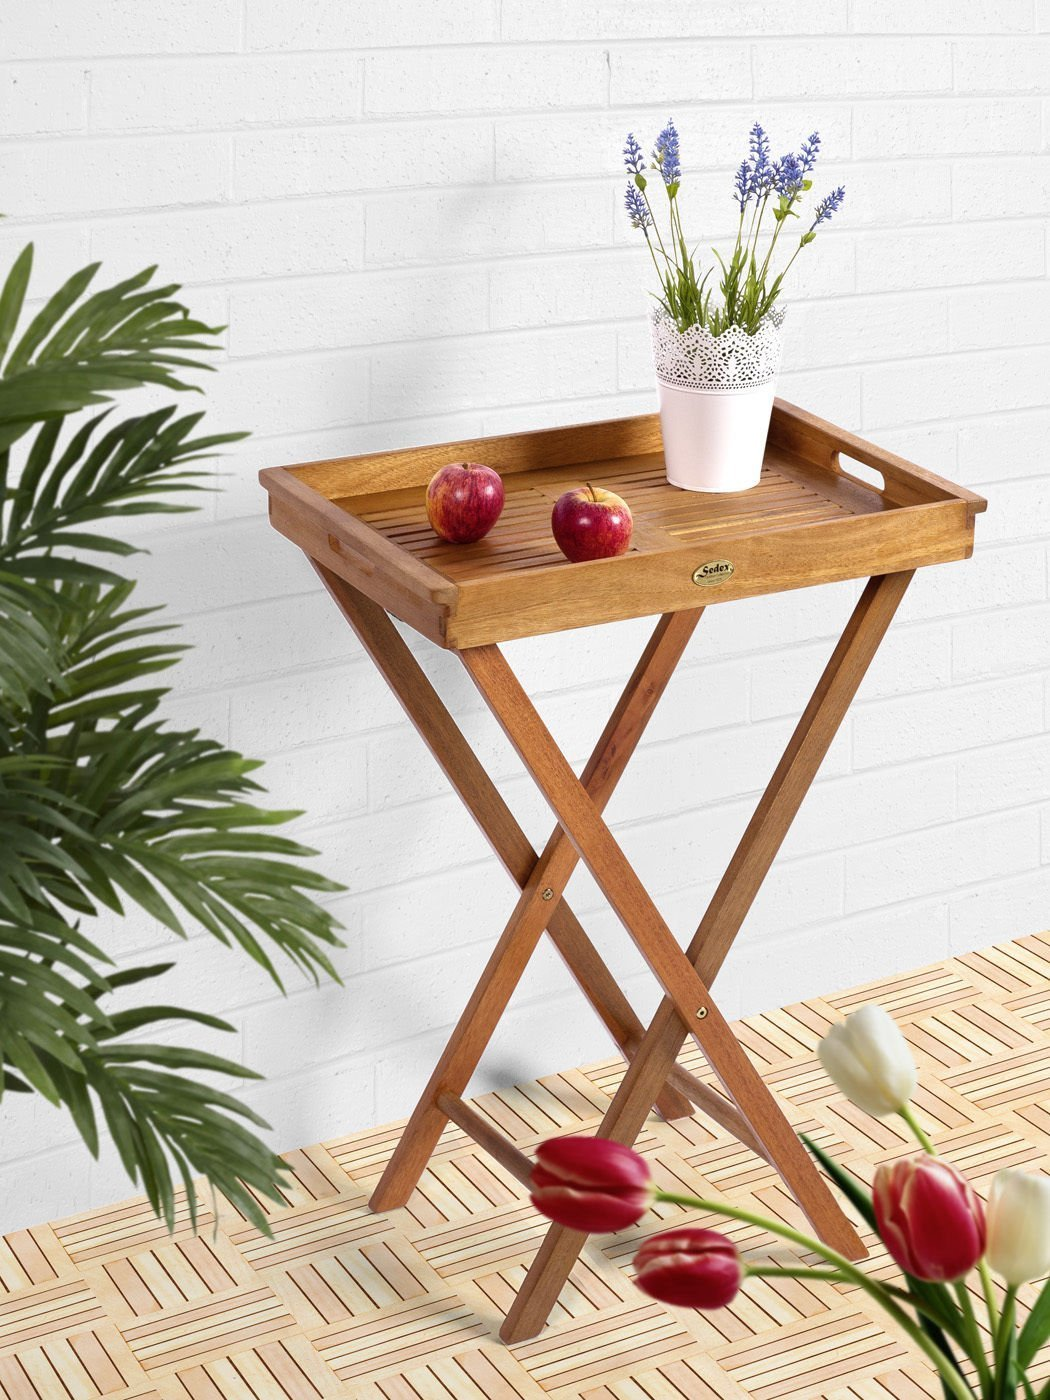 alkon Klapptisch BISTRO FSC Eukalyptus, natur geölt, abnehmbares Tablett – Modell DELHI günstig online kaufen